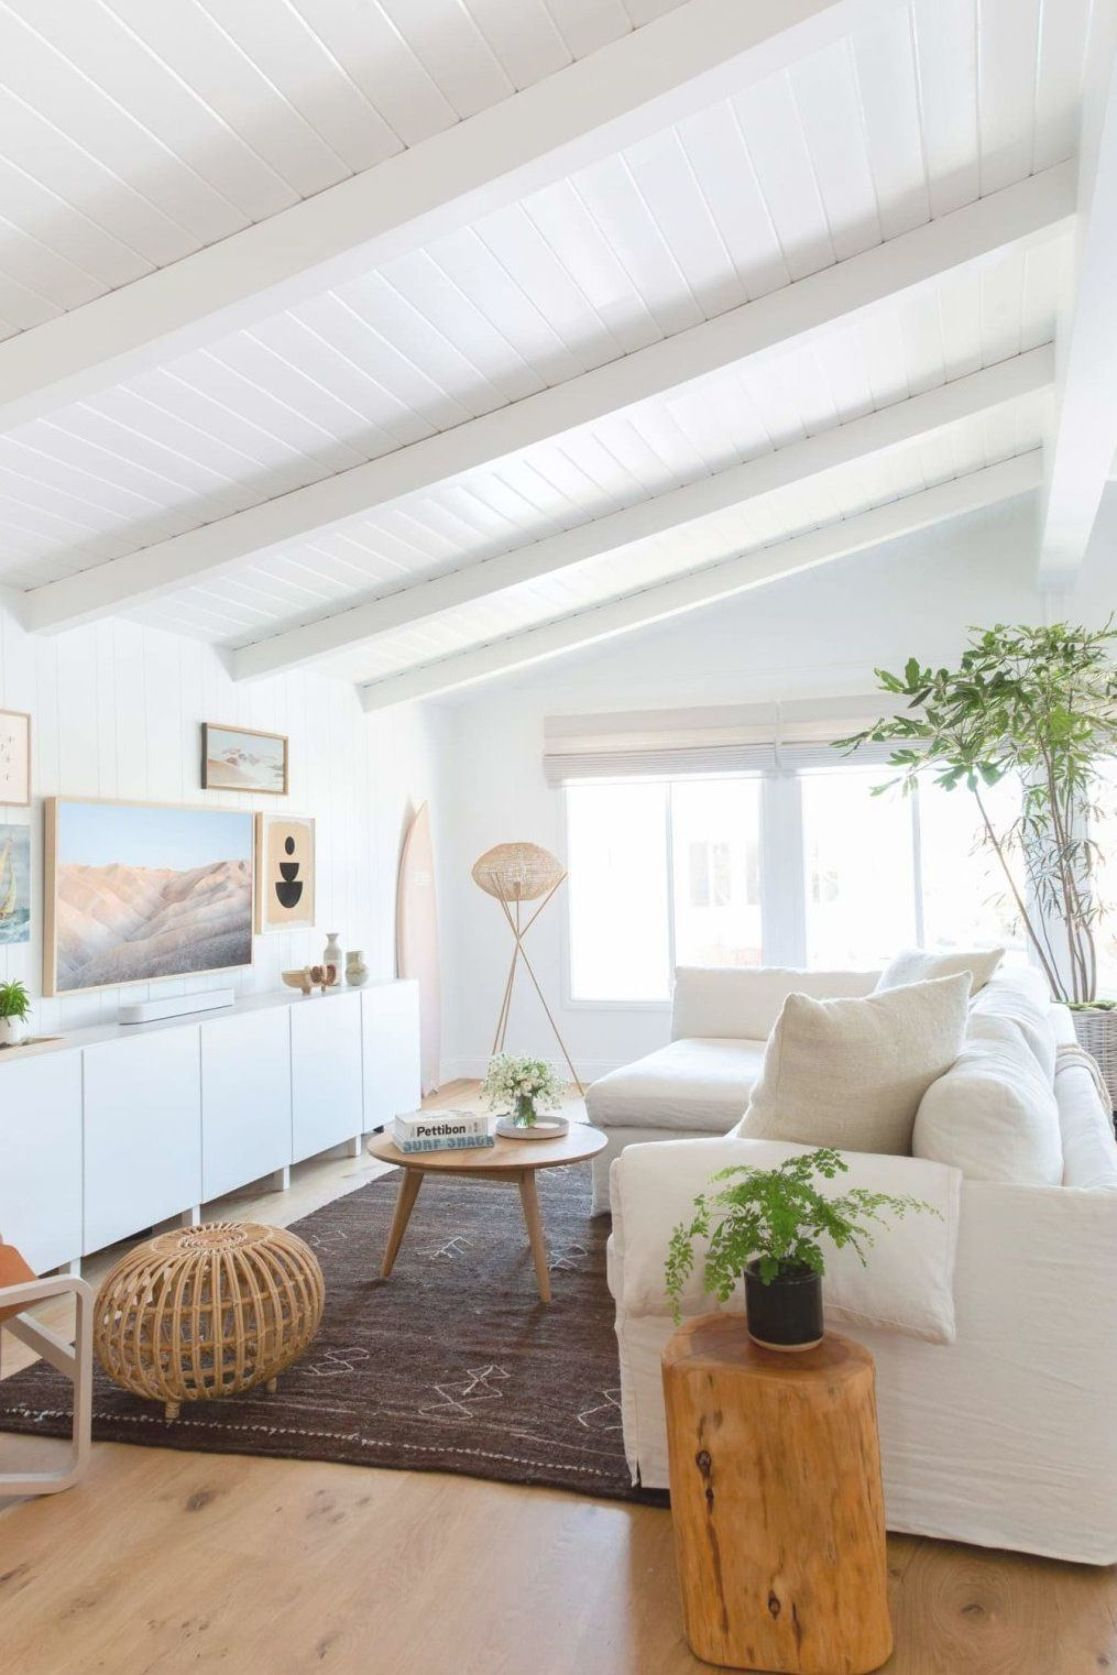 Minimalist Beach House: This Beachy Minimalist House Has A Breezy And Bright